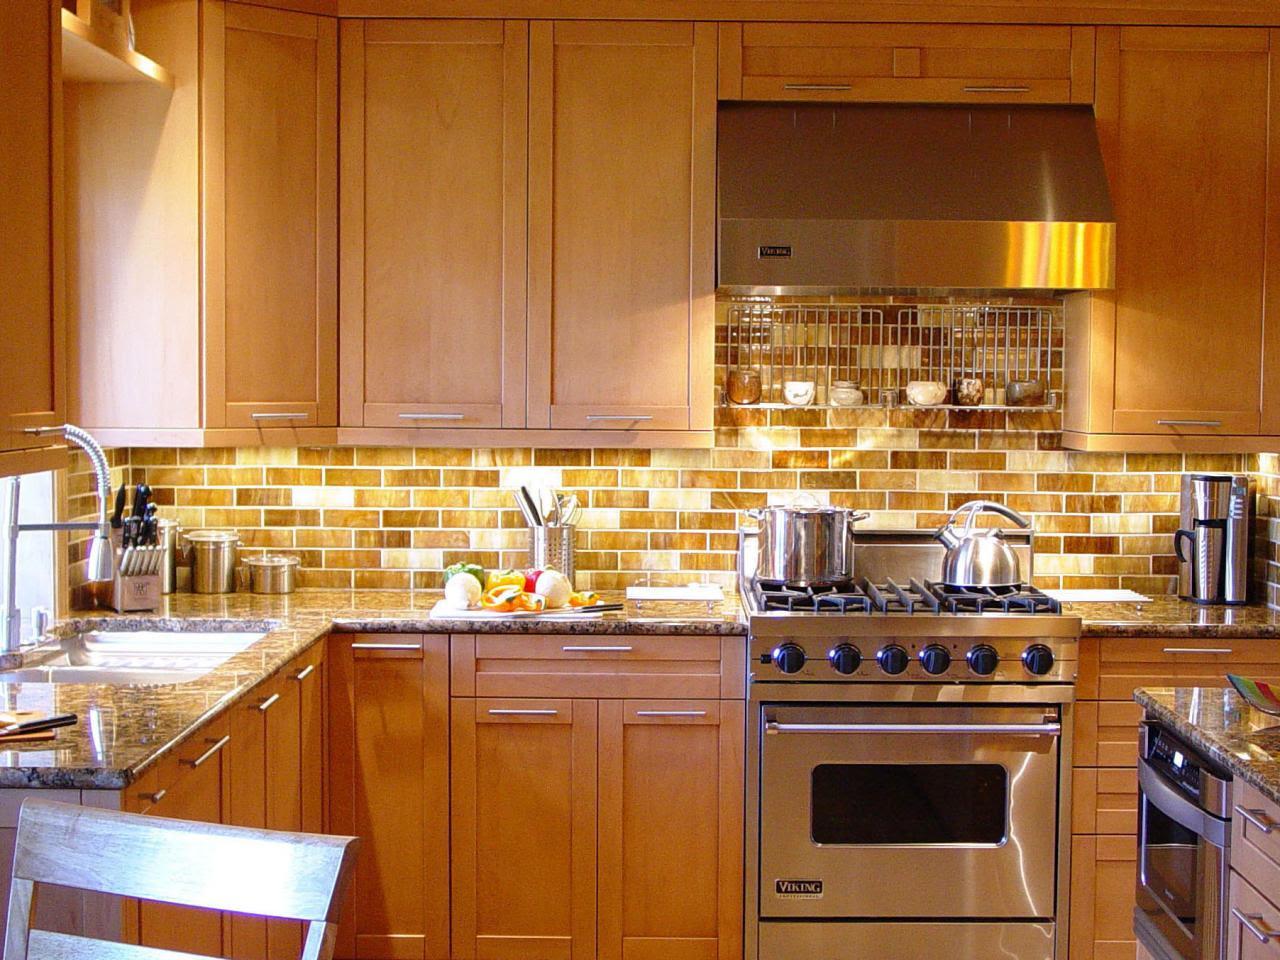 Backsplash Tiles For Kitchen Ideas Mouzz Home